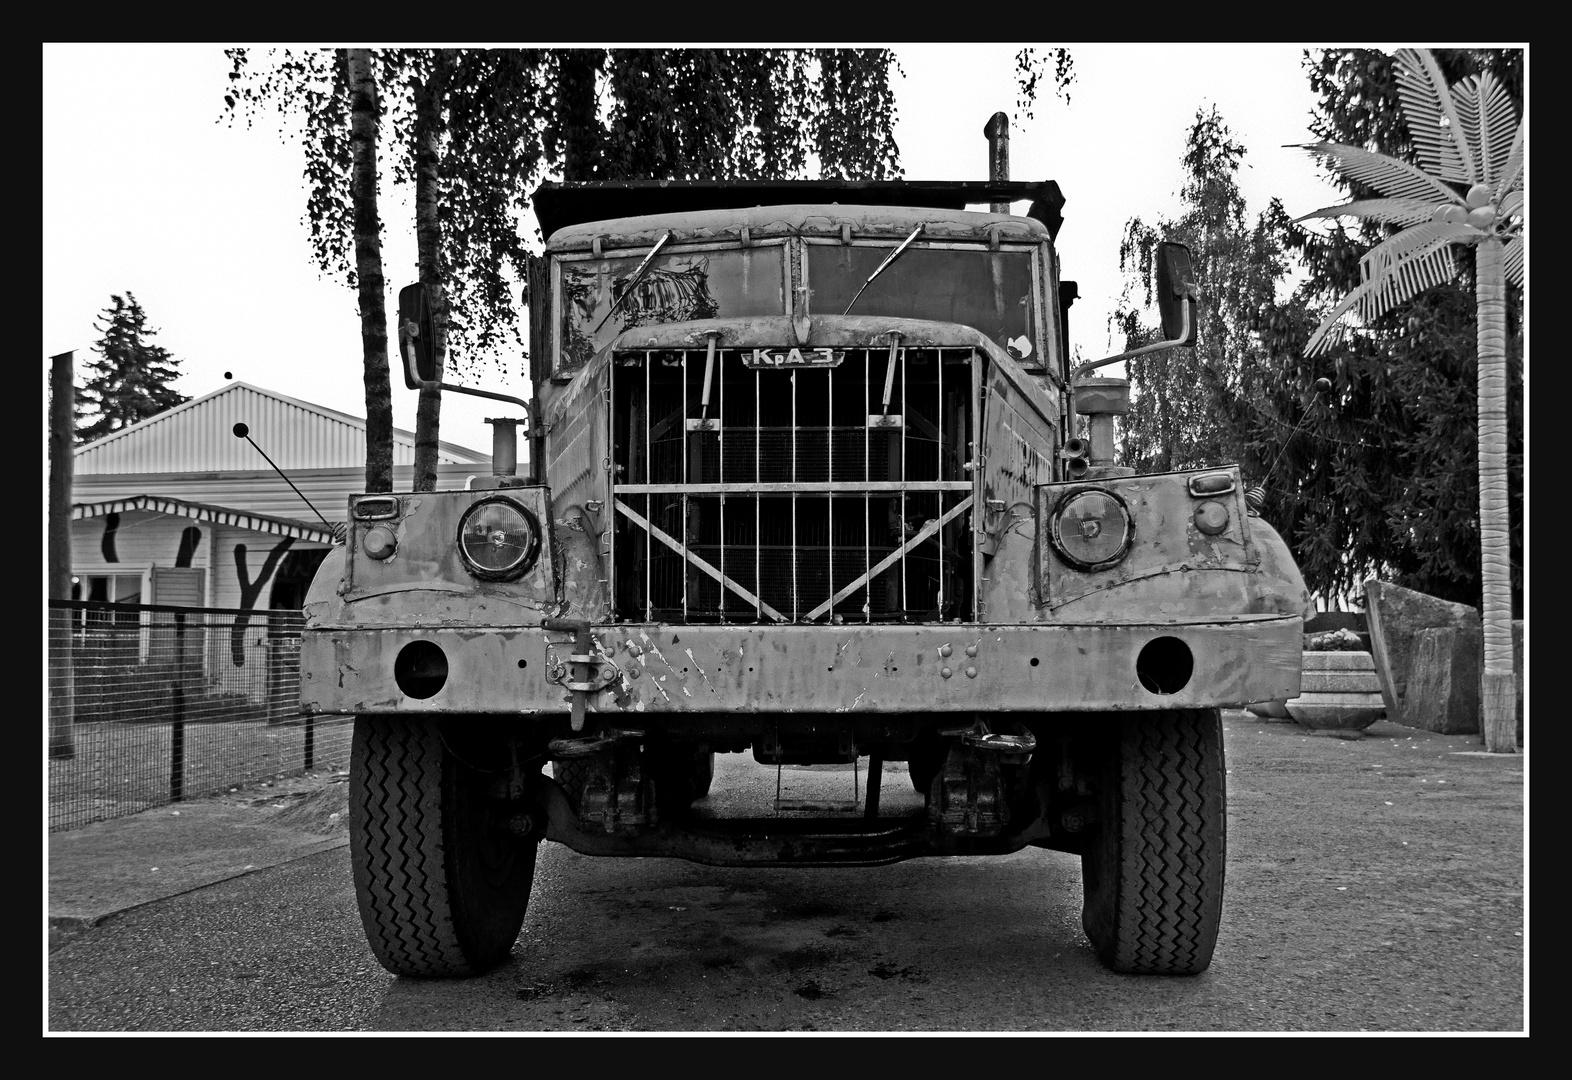 Russischer KpA3